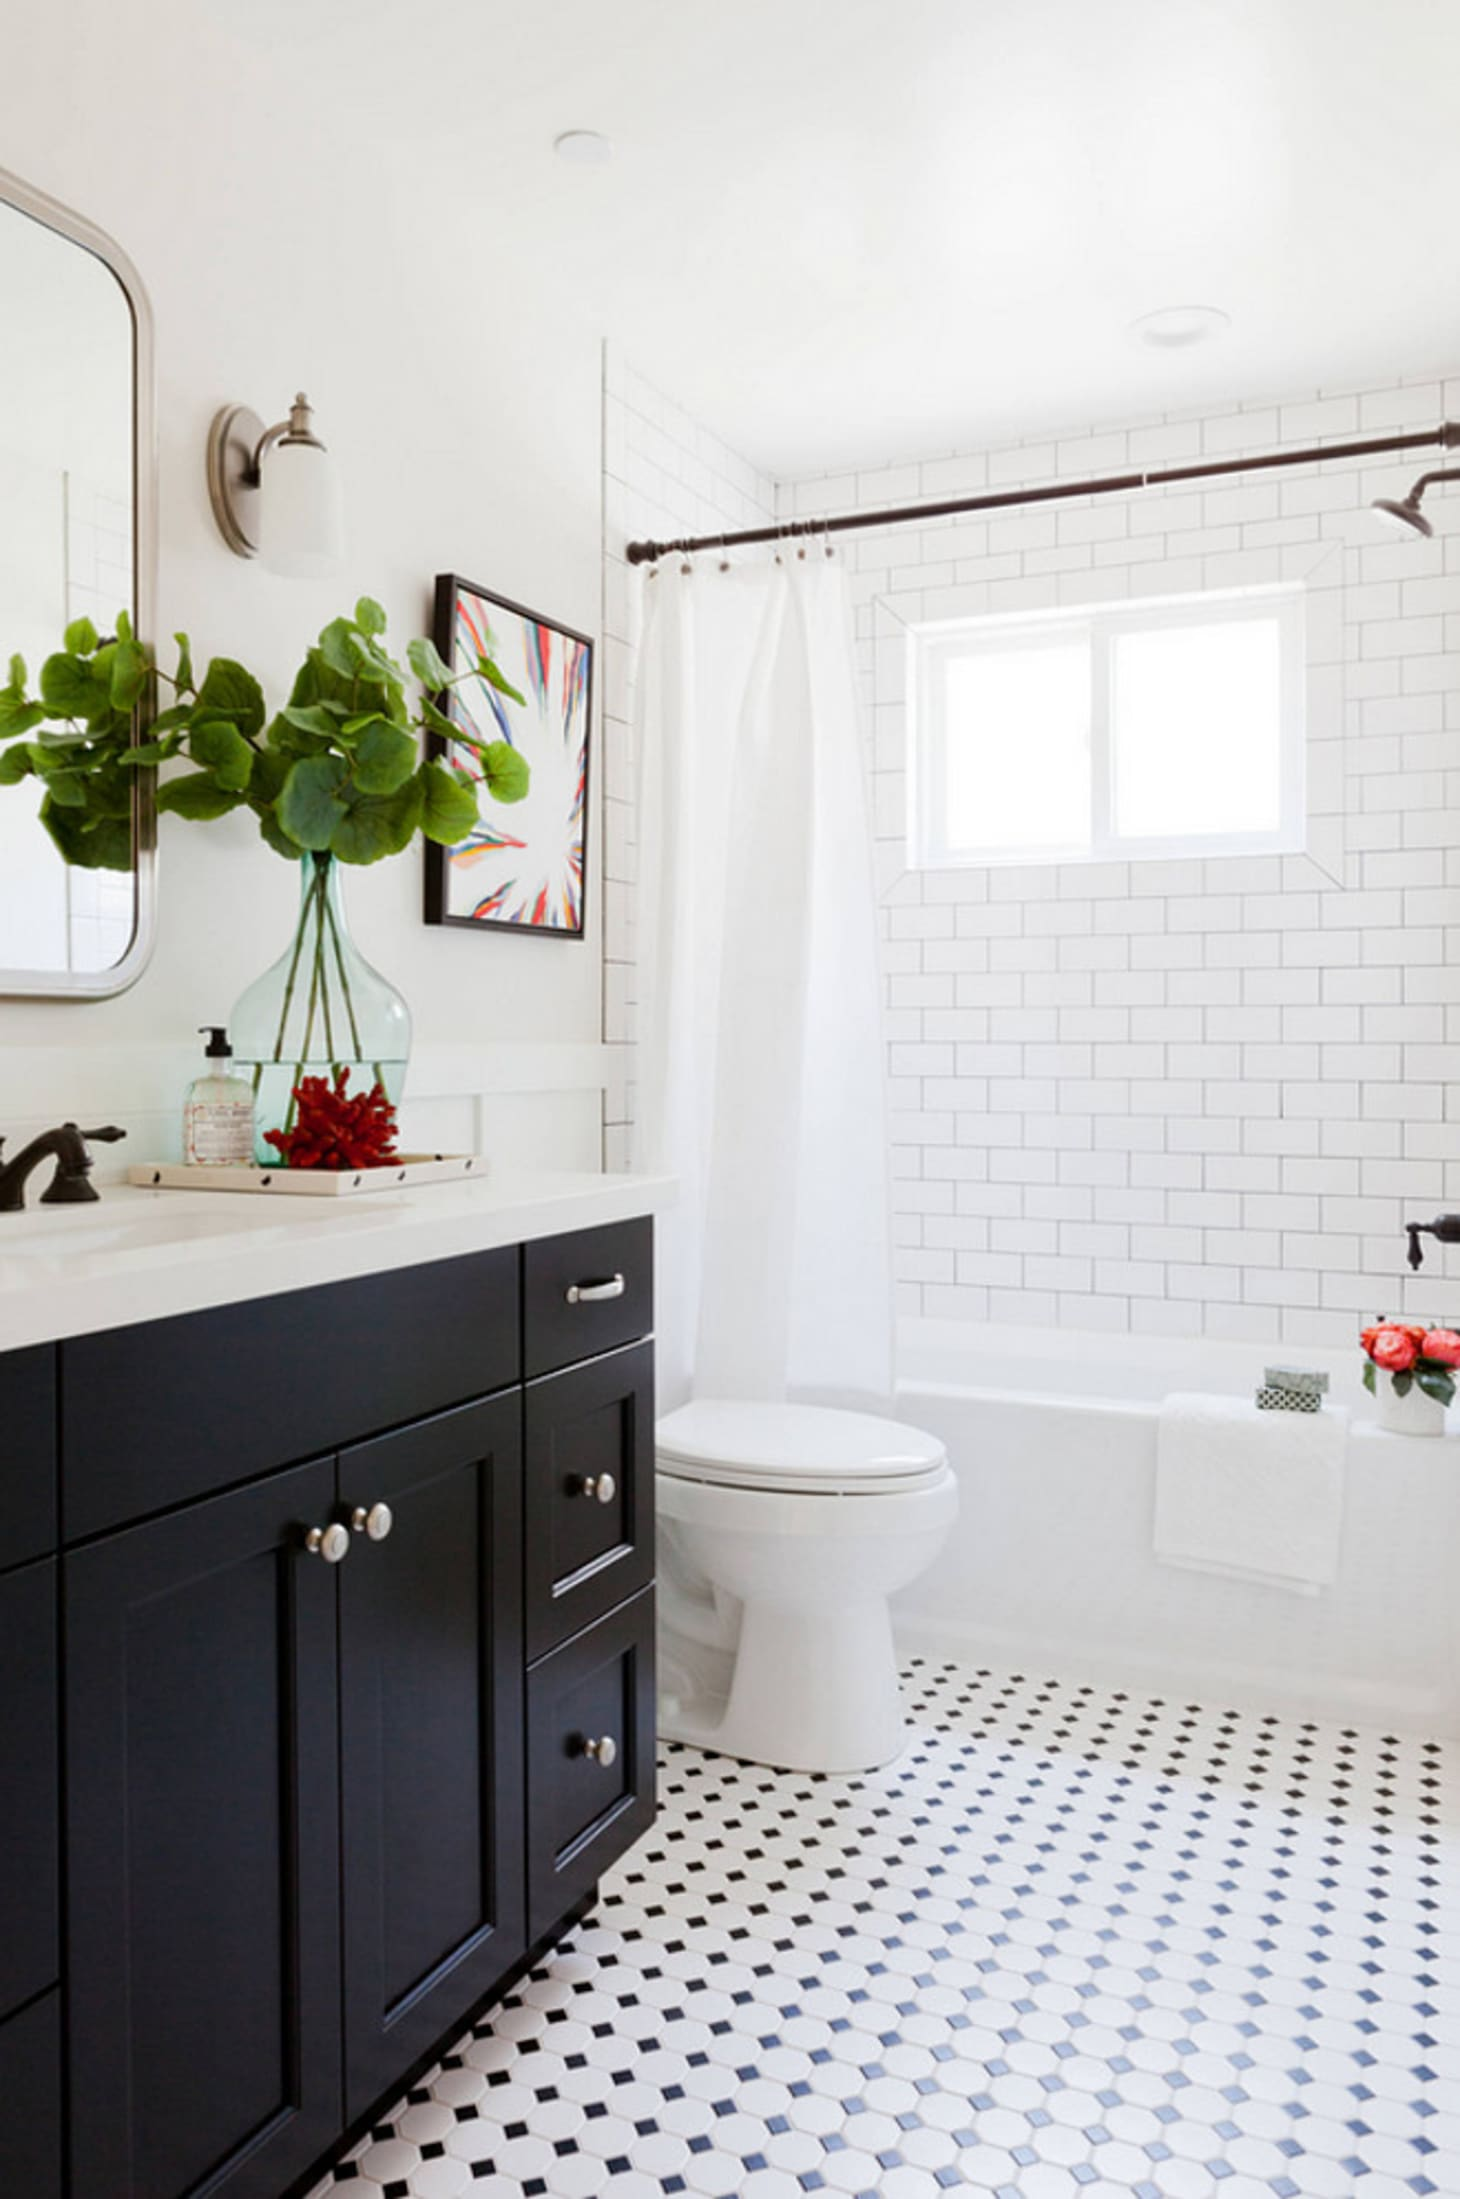 Mosaic Tile Floor Ideas for Vintage Style Bathrooms ...